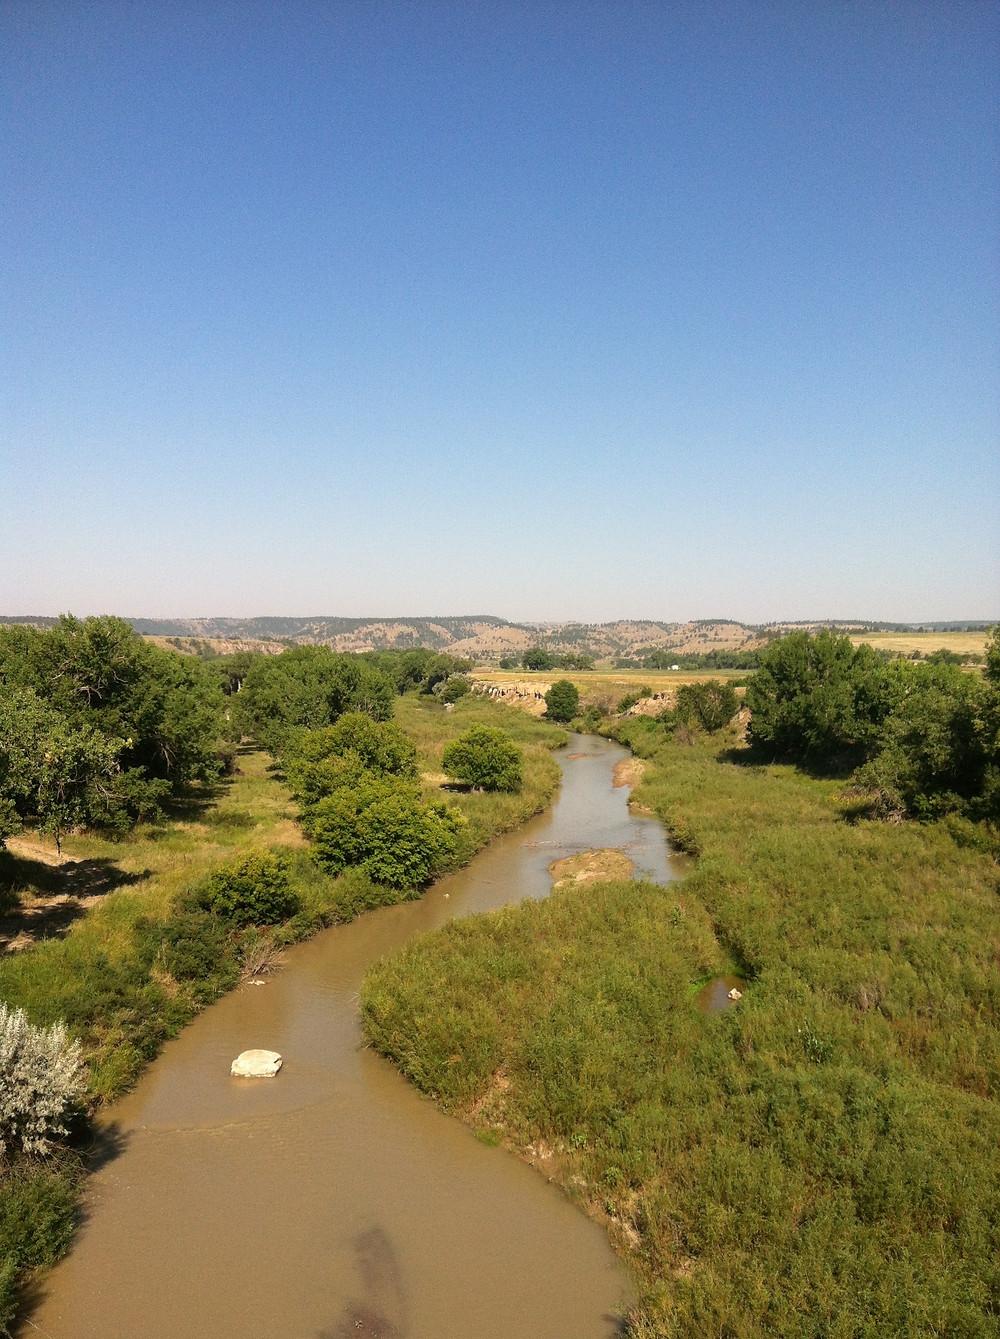 Cheyenne River, tributary of Missouri River